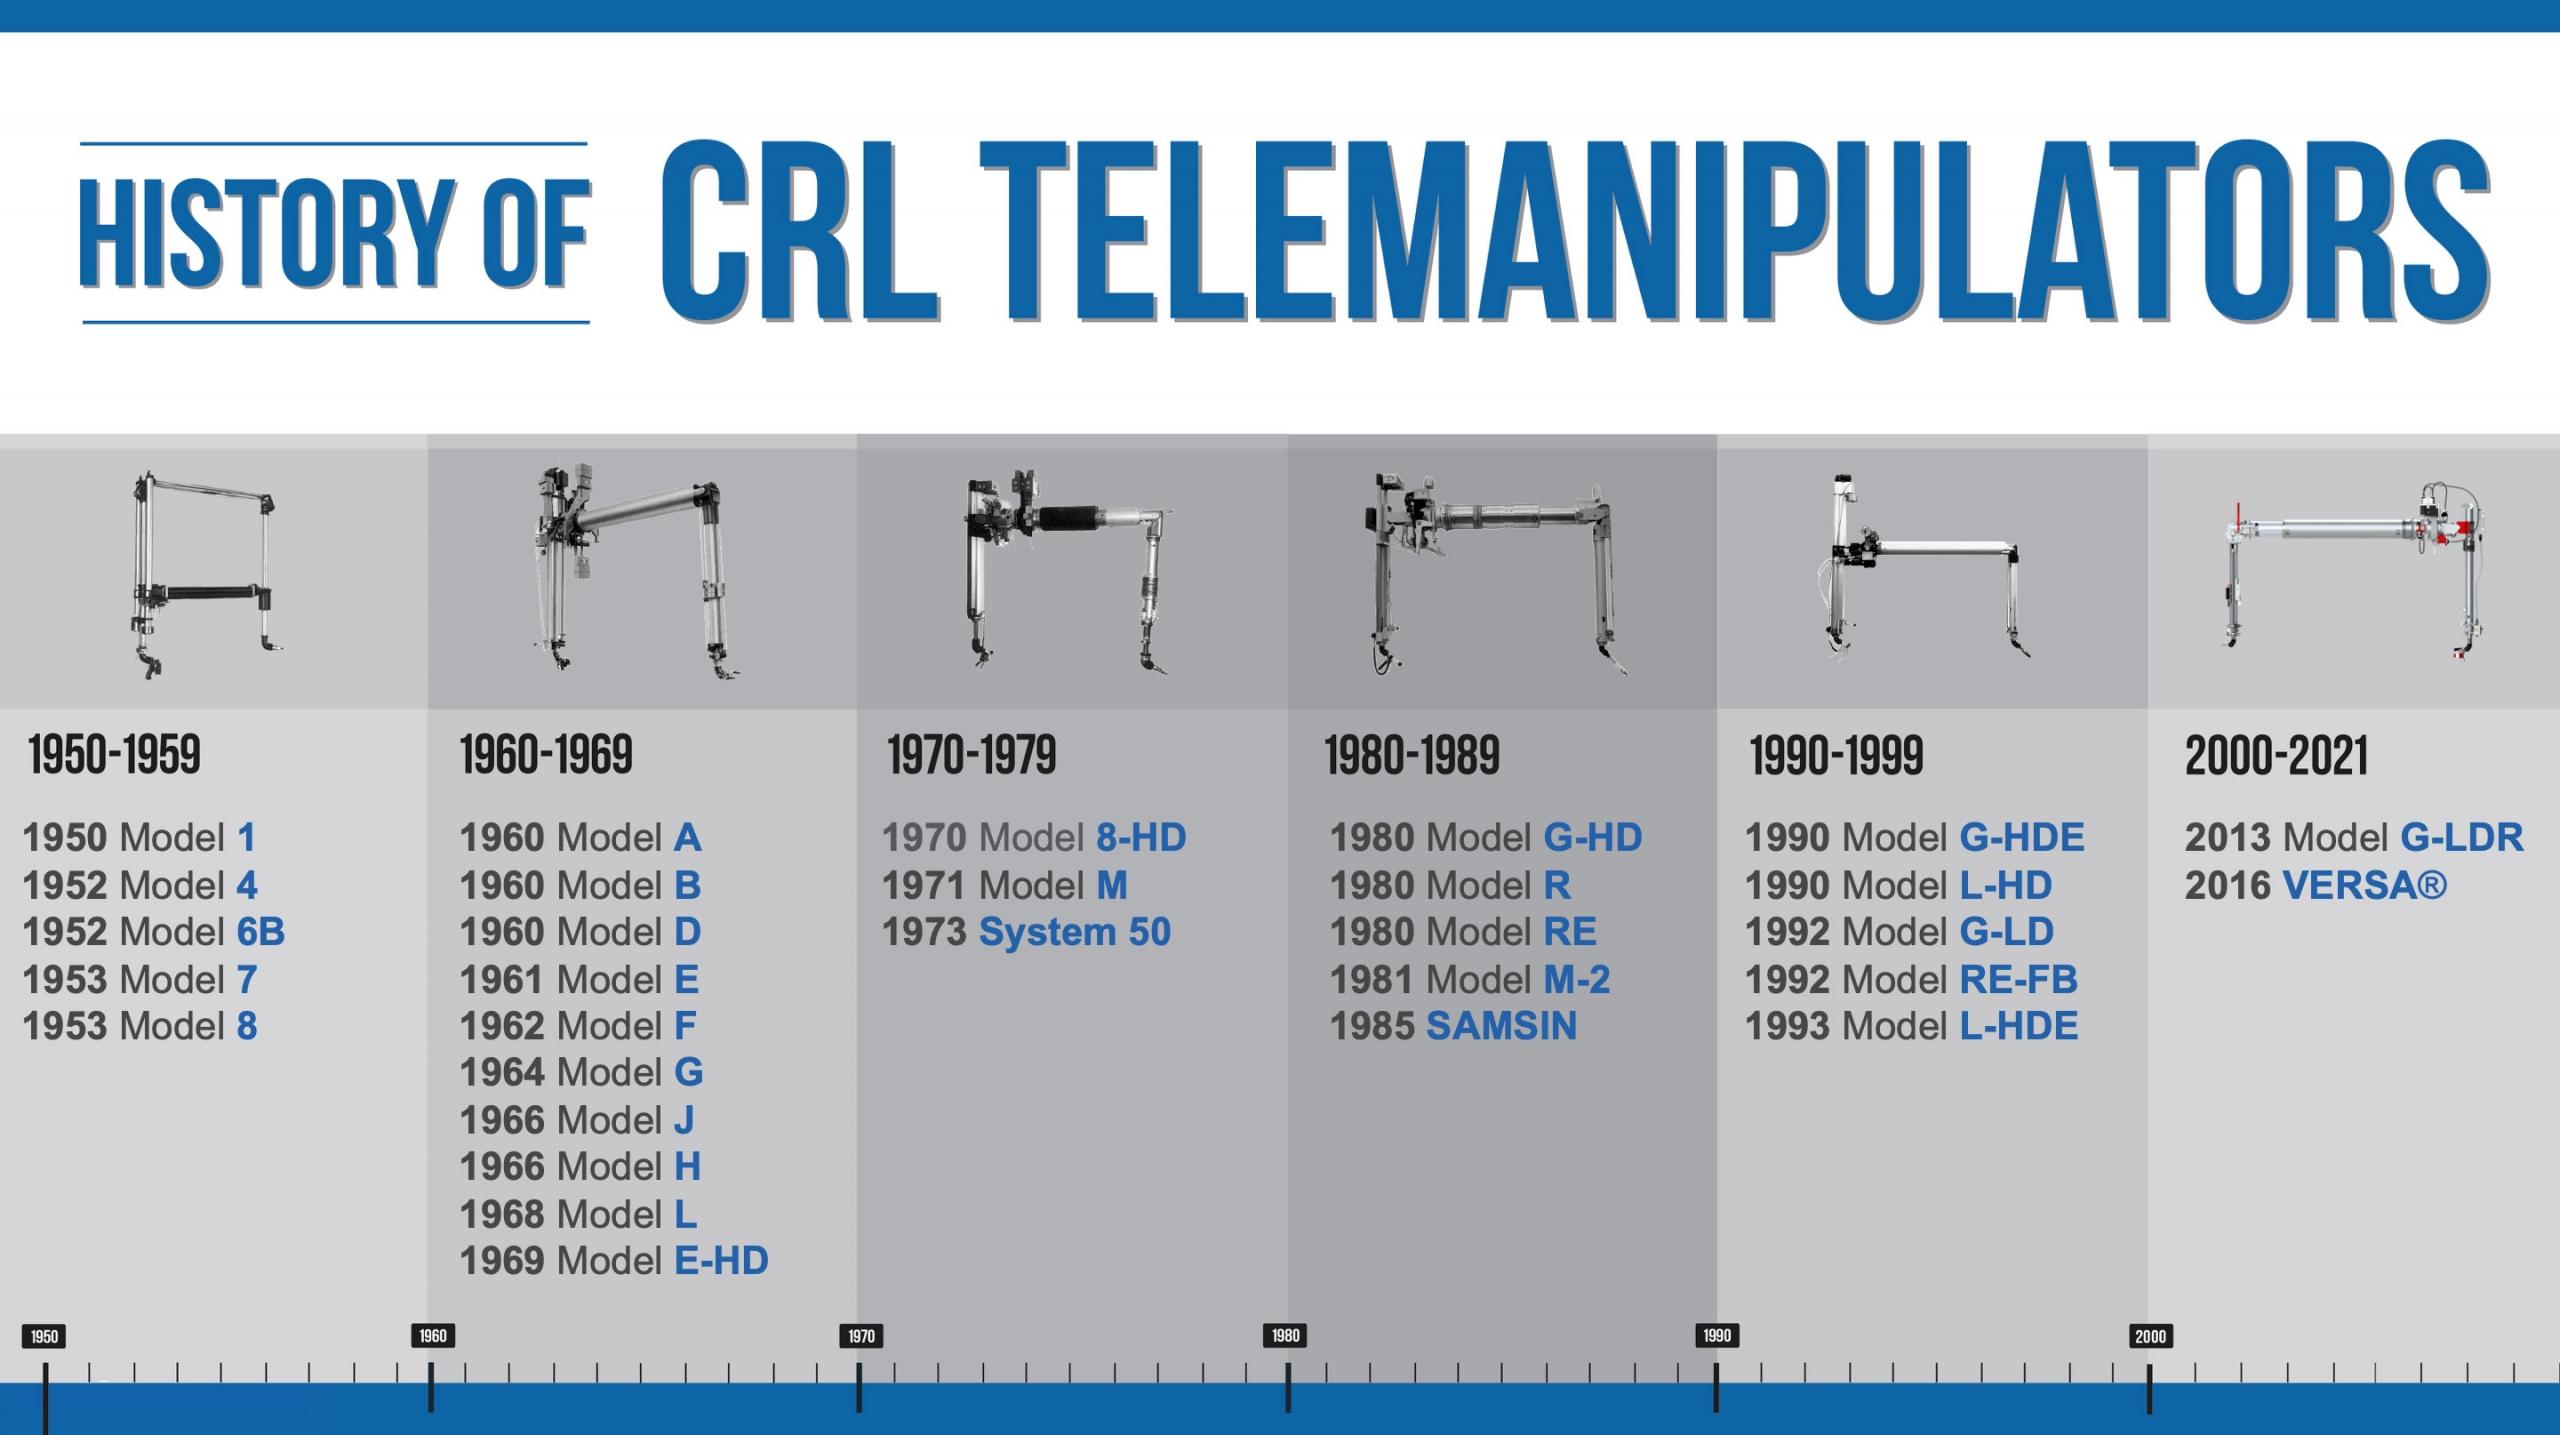 CRL Telemanipulator History